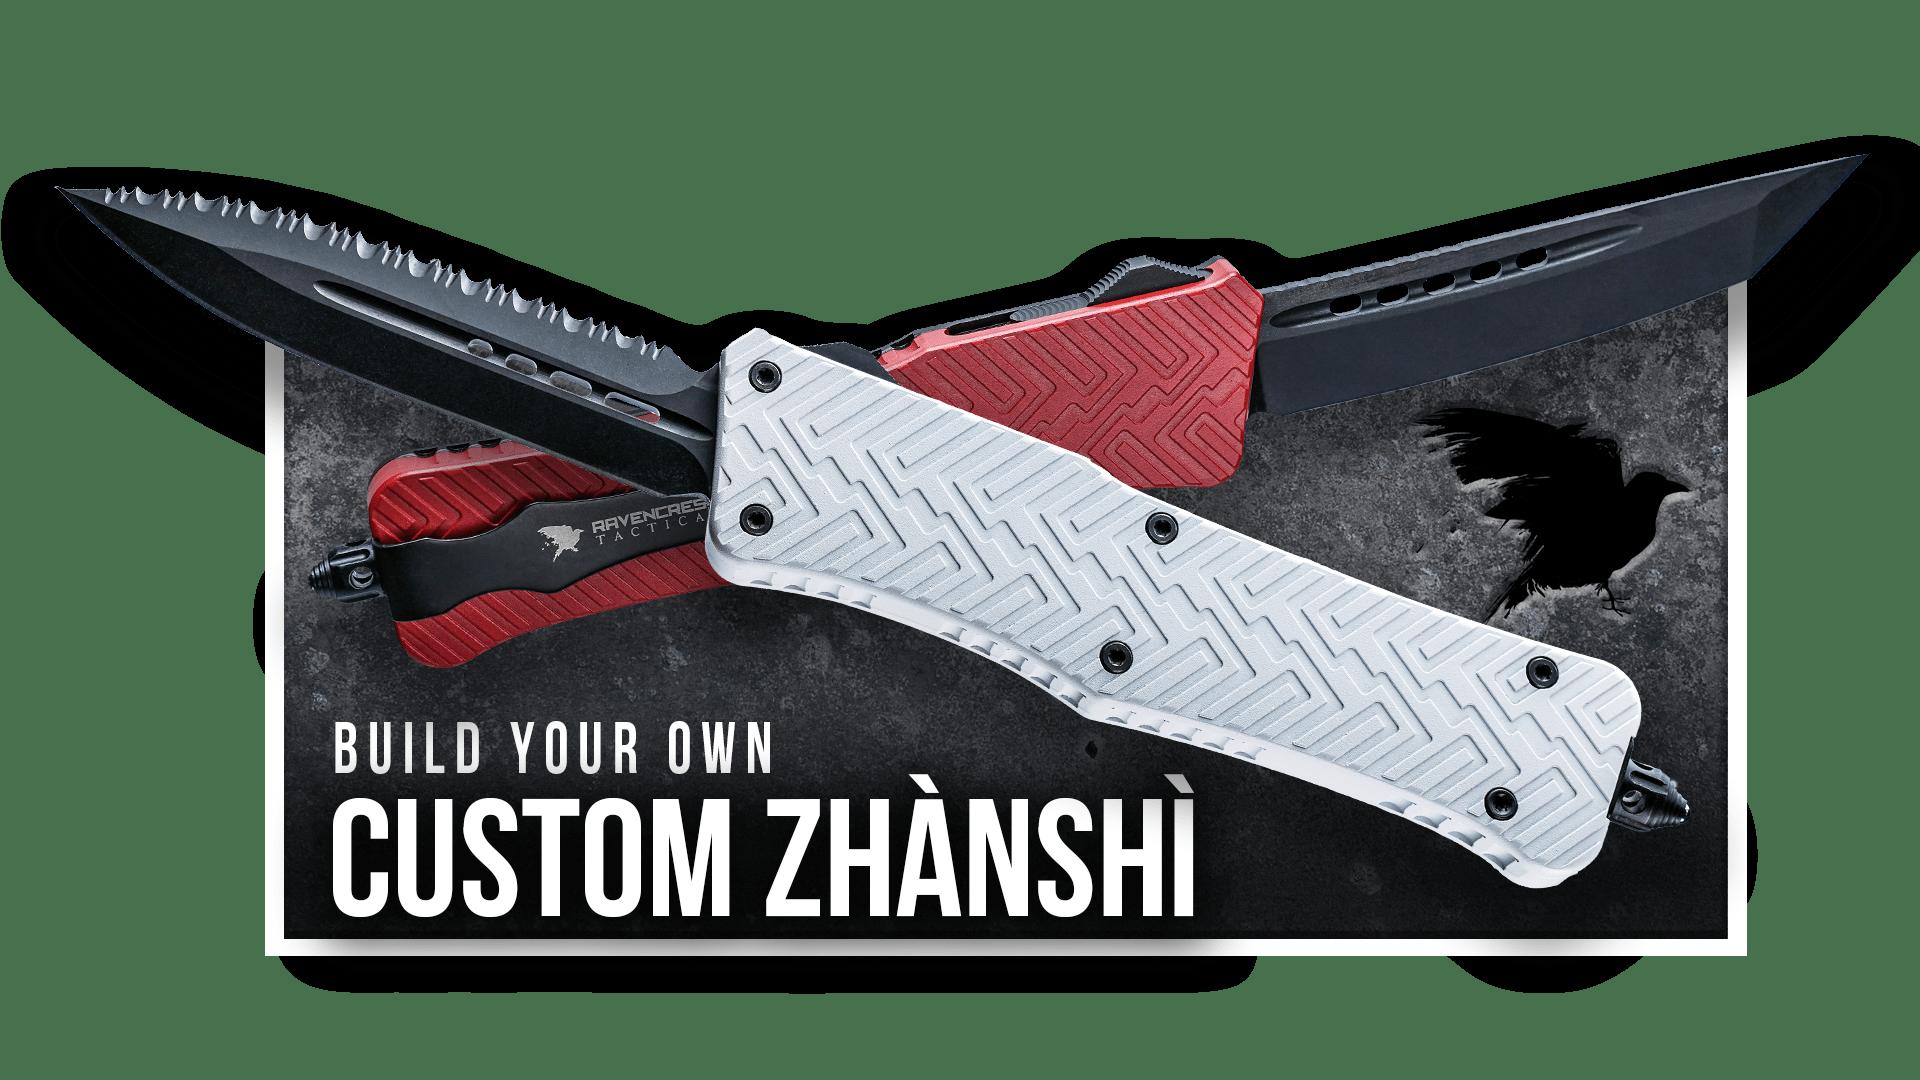 Build Your Own - Zhanshi OTF Knife